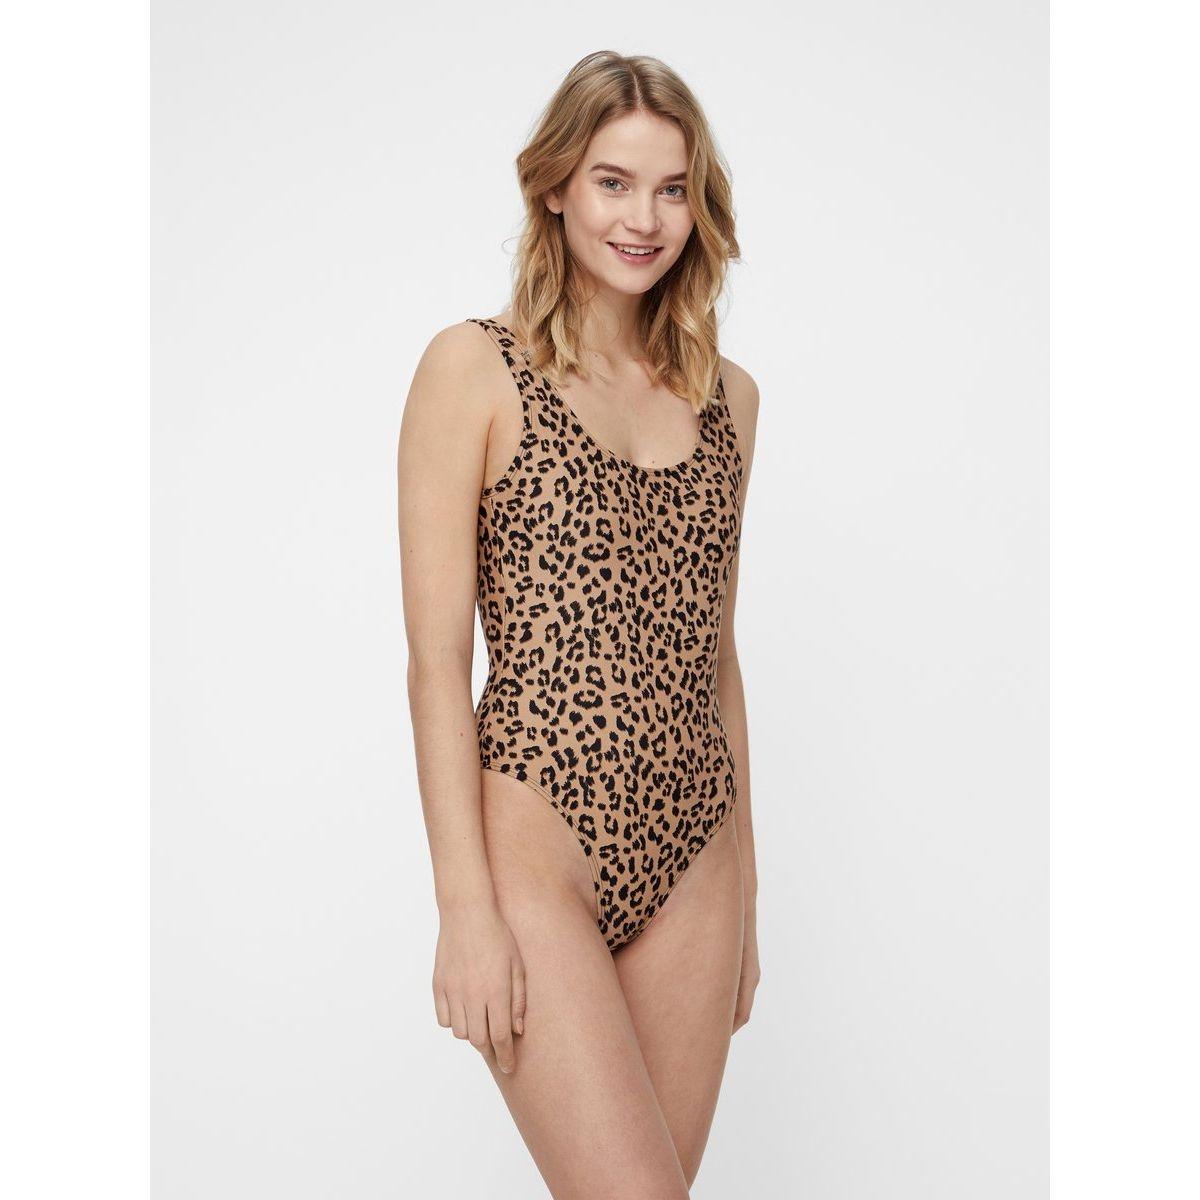 Maillot de bain Imprimé léopard